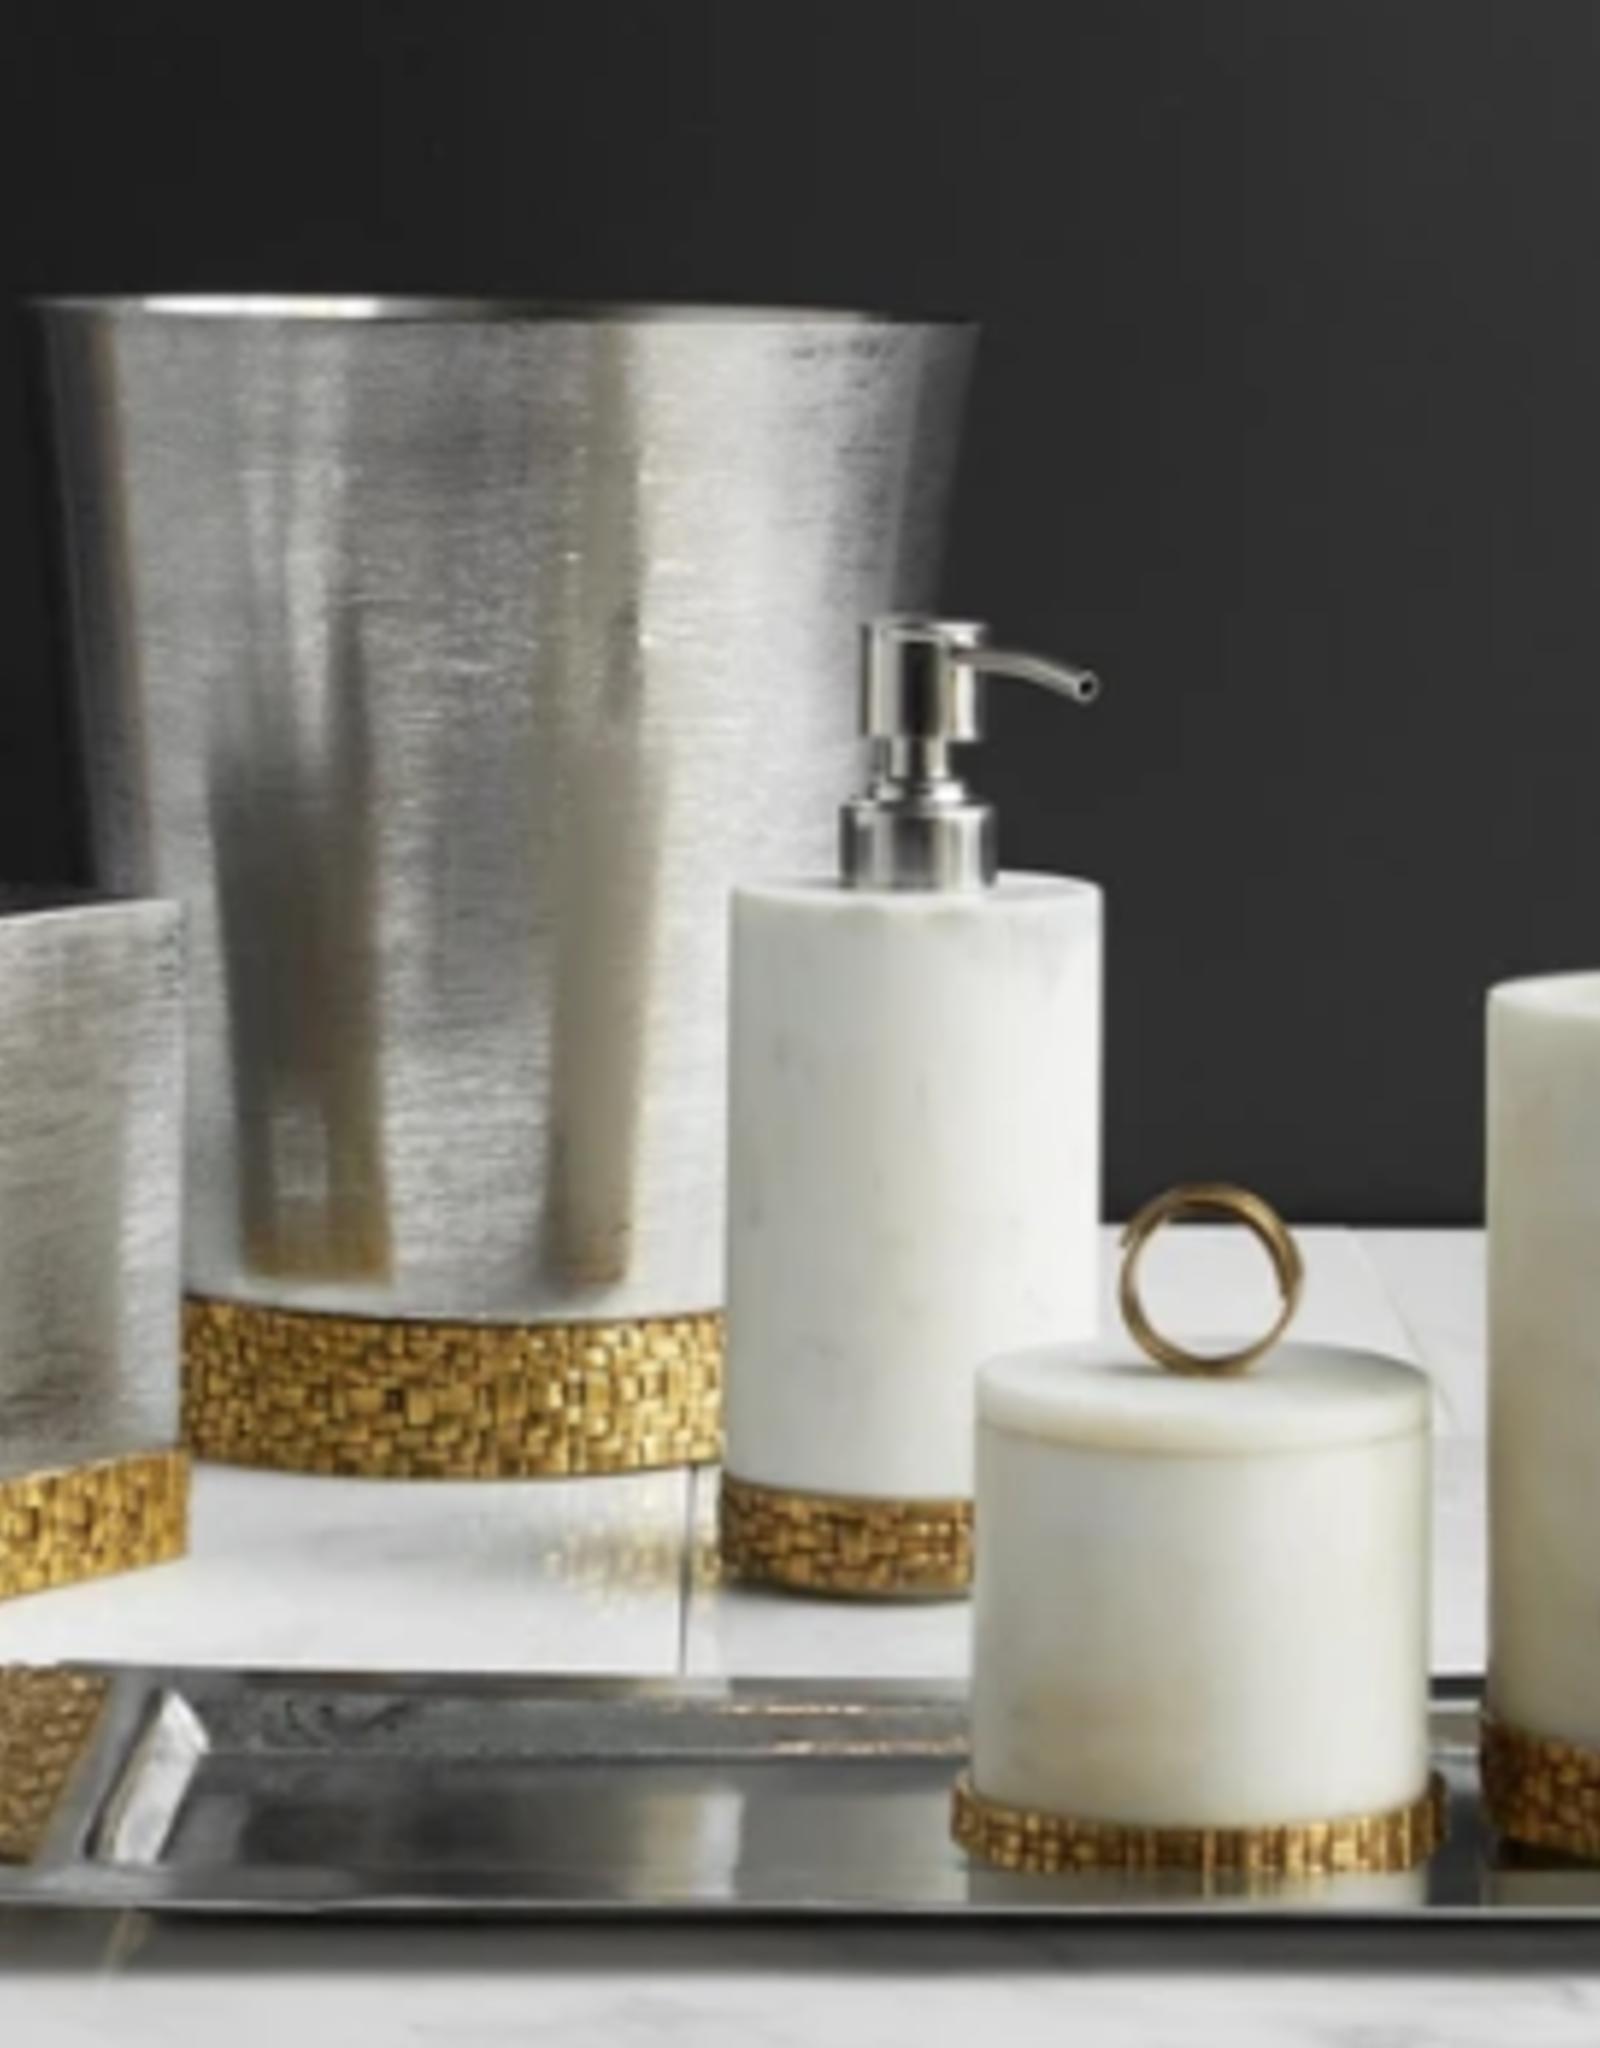 Michael Aram Palm Collection Bath Accessories